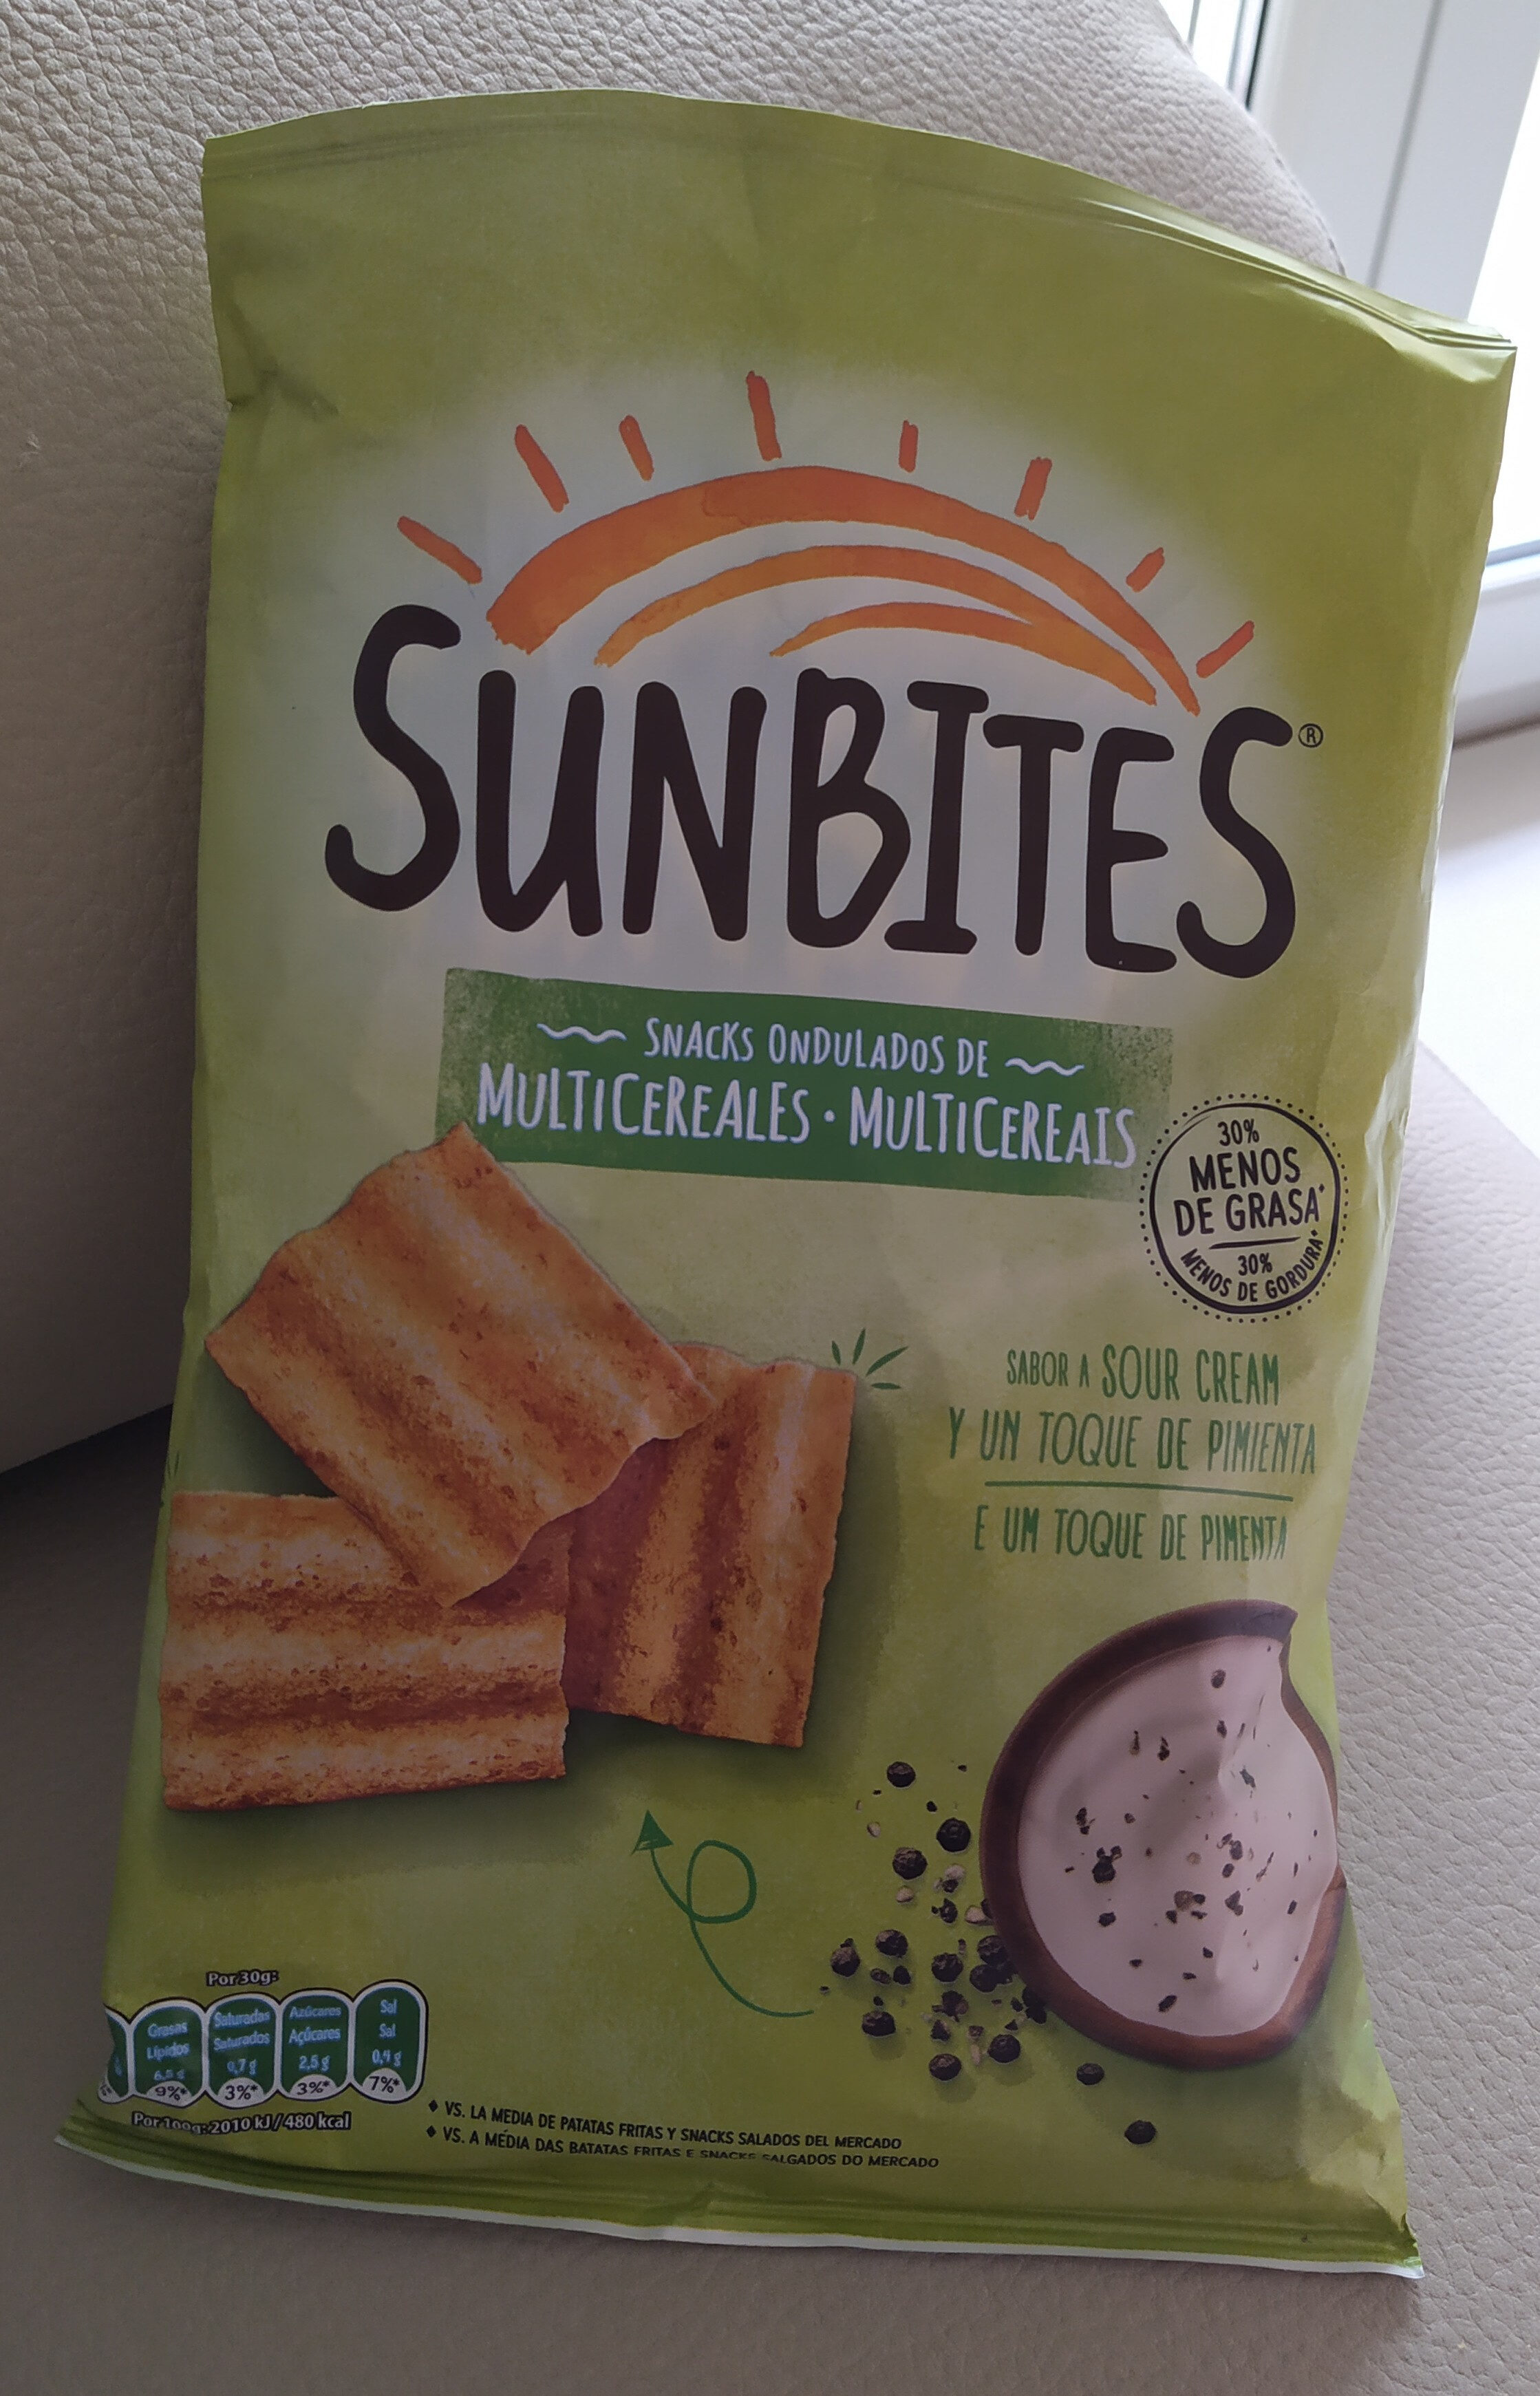 Snack ondulados de multicereales con sabor a Sour Cream bolsa 95 g - Produto - es